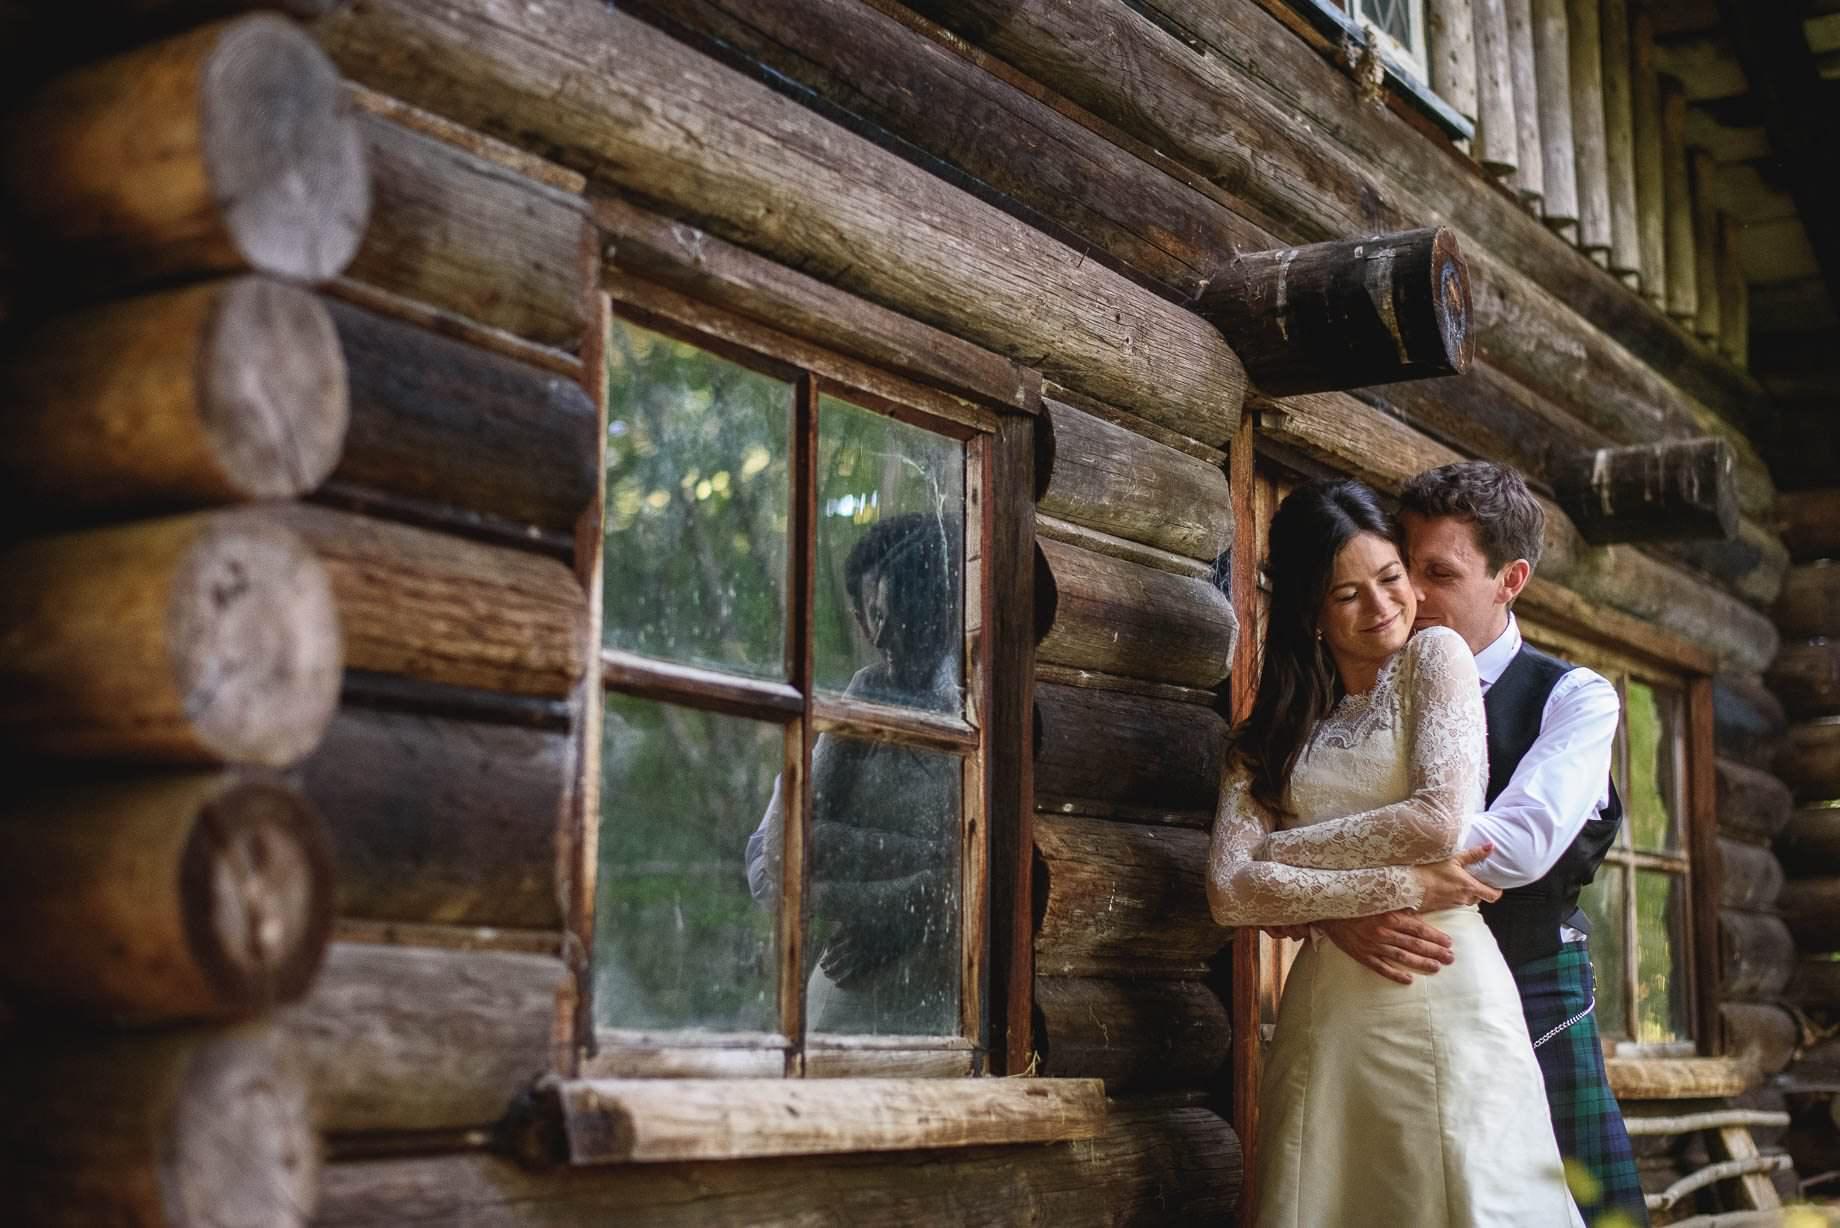 Gildings Barn wedding photography - Sarah and Steve (159 of 190)